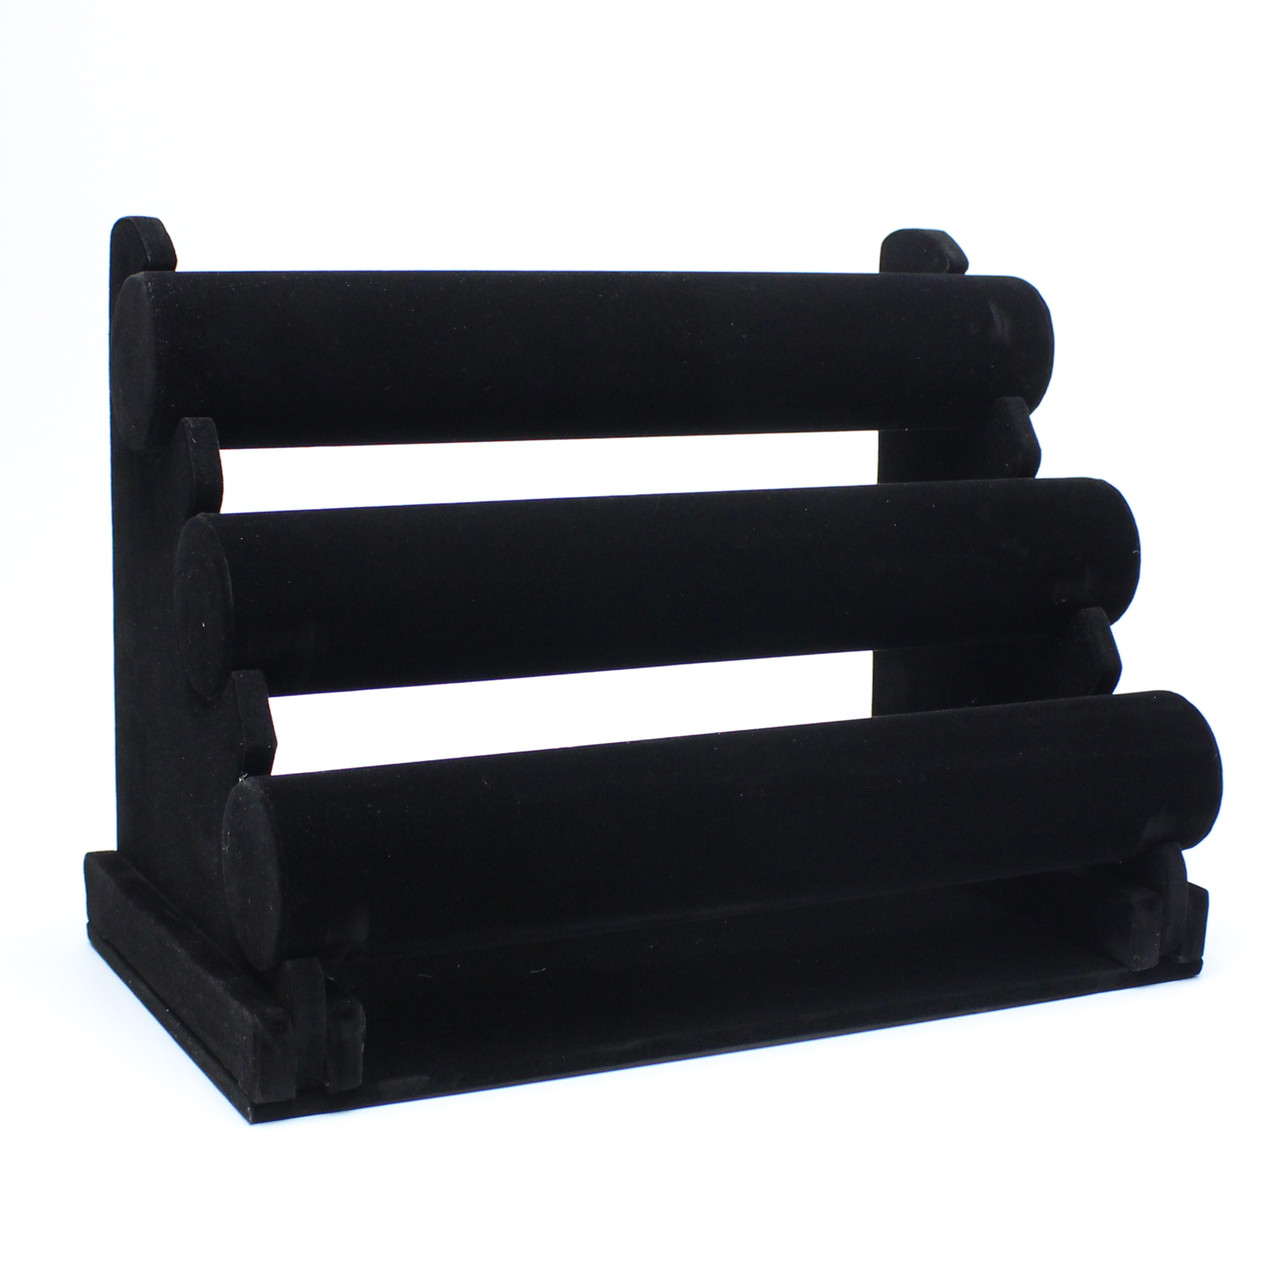 Подставка для браслетов 3-х рядная черная